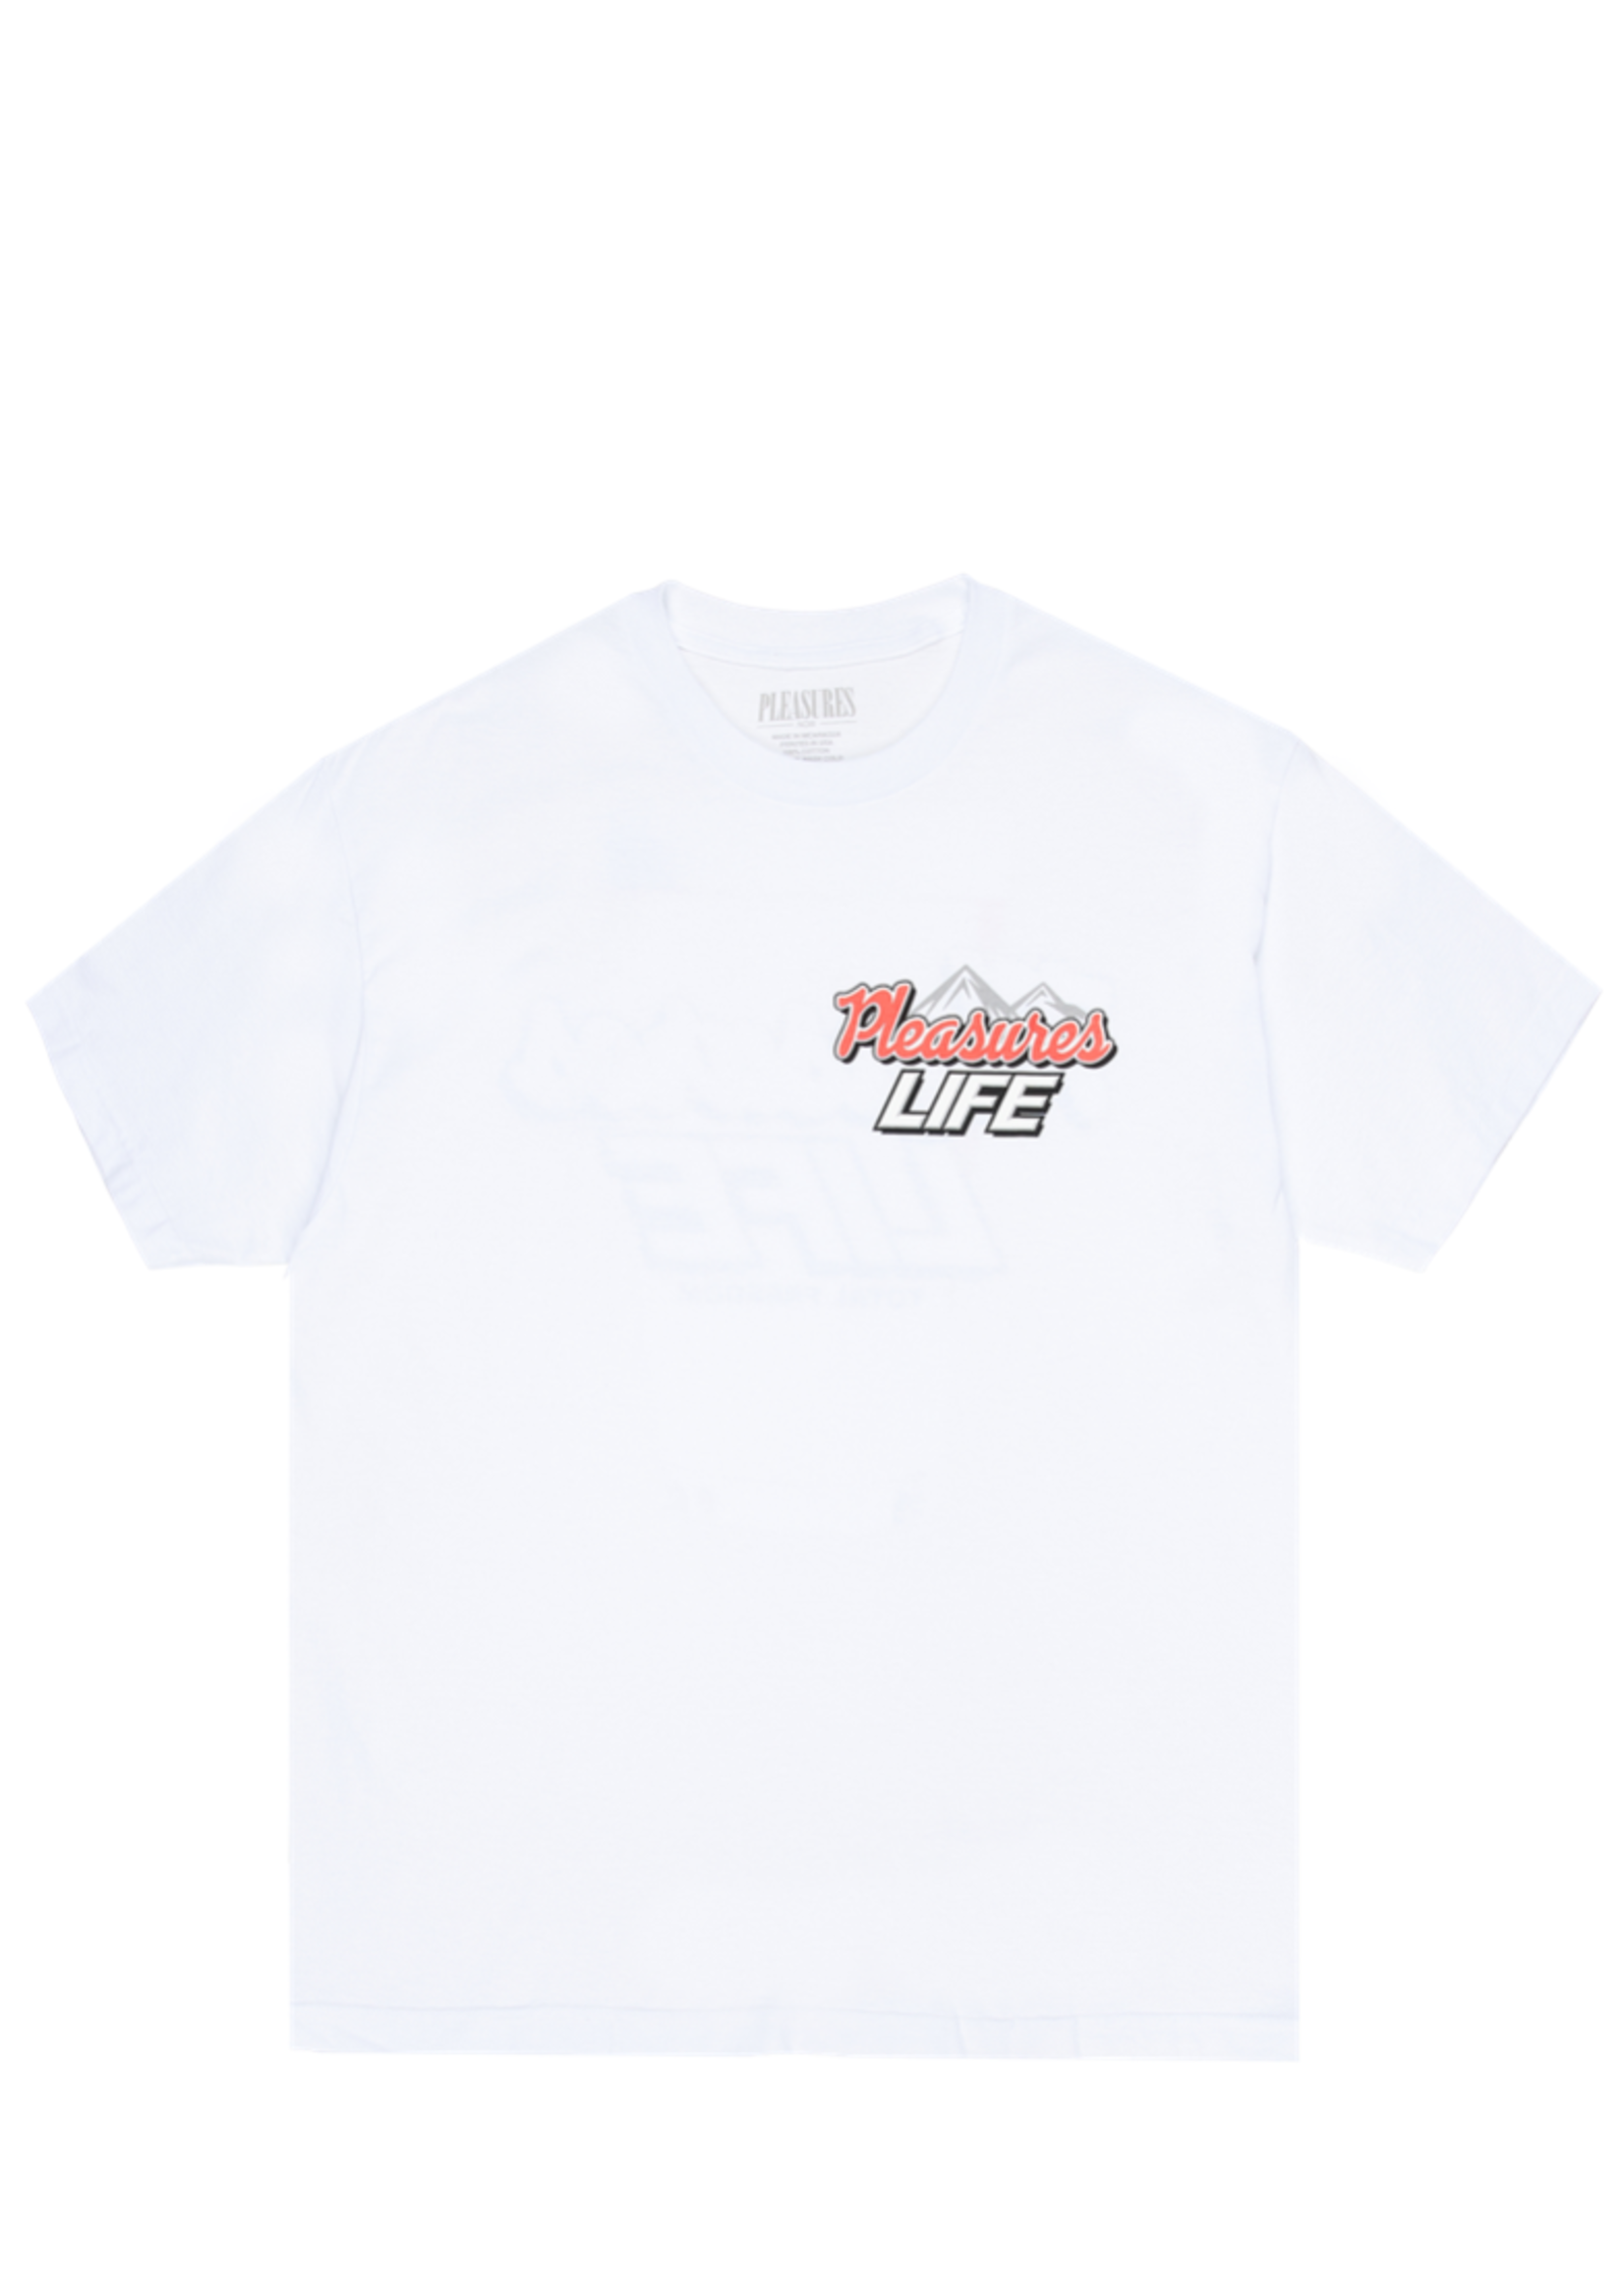 PLEASURES Refresh T-shirt in White